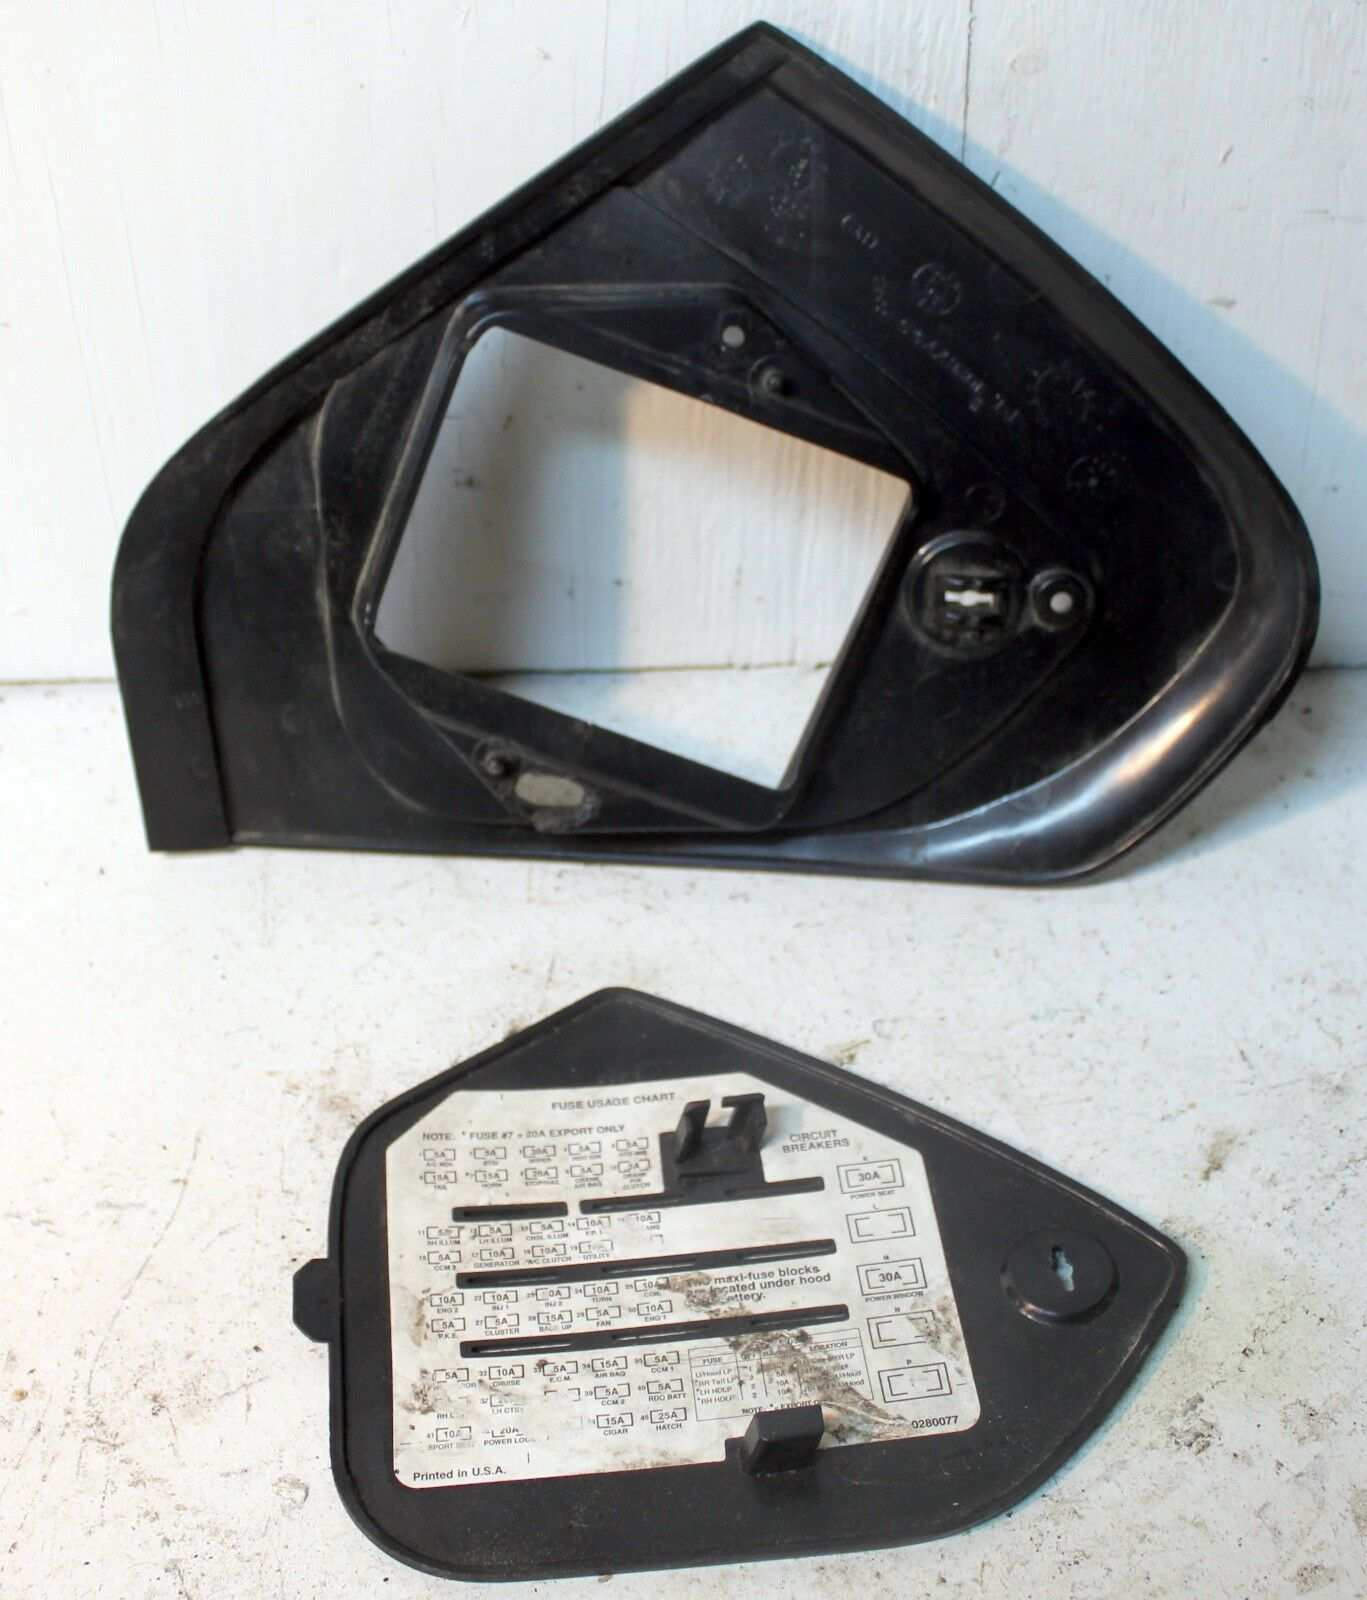 94-96 C4 Corvette Interior Fuse Panel Door Cover and Bezel GM 10267755 |  eBay